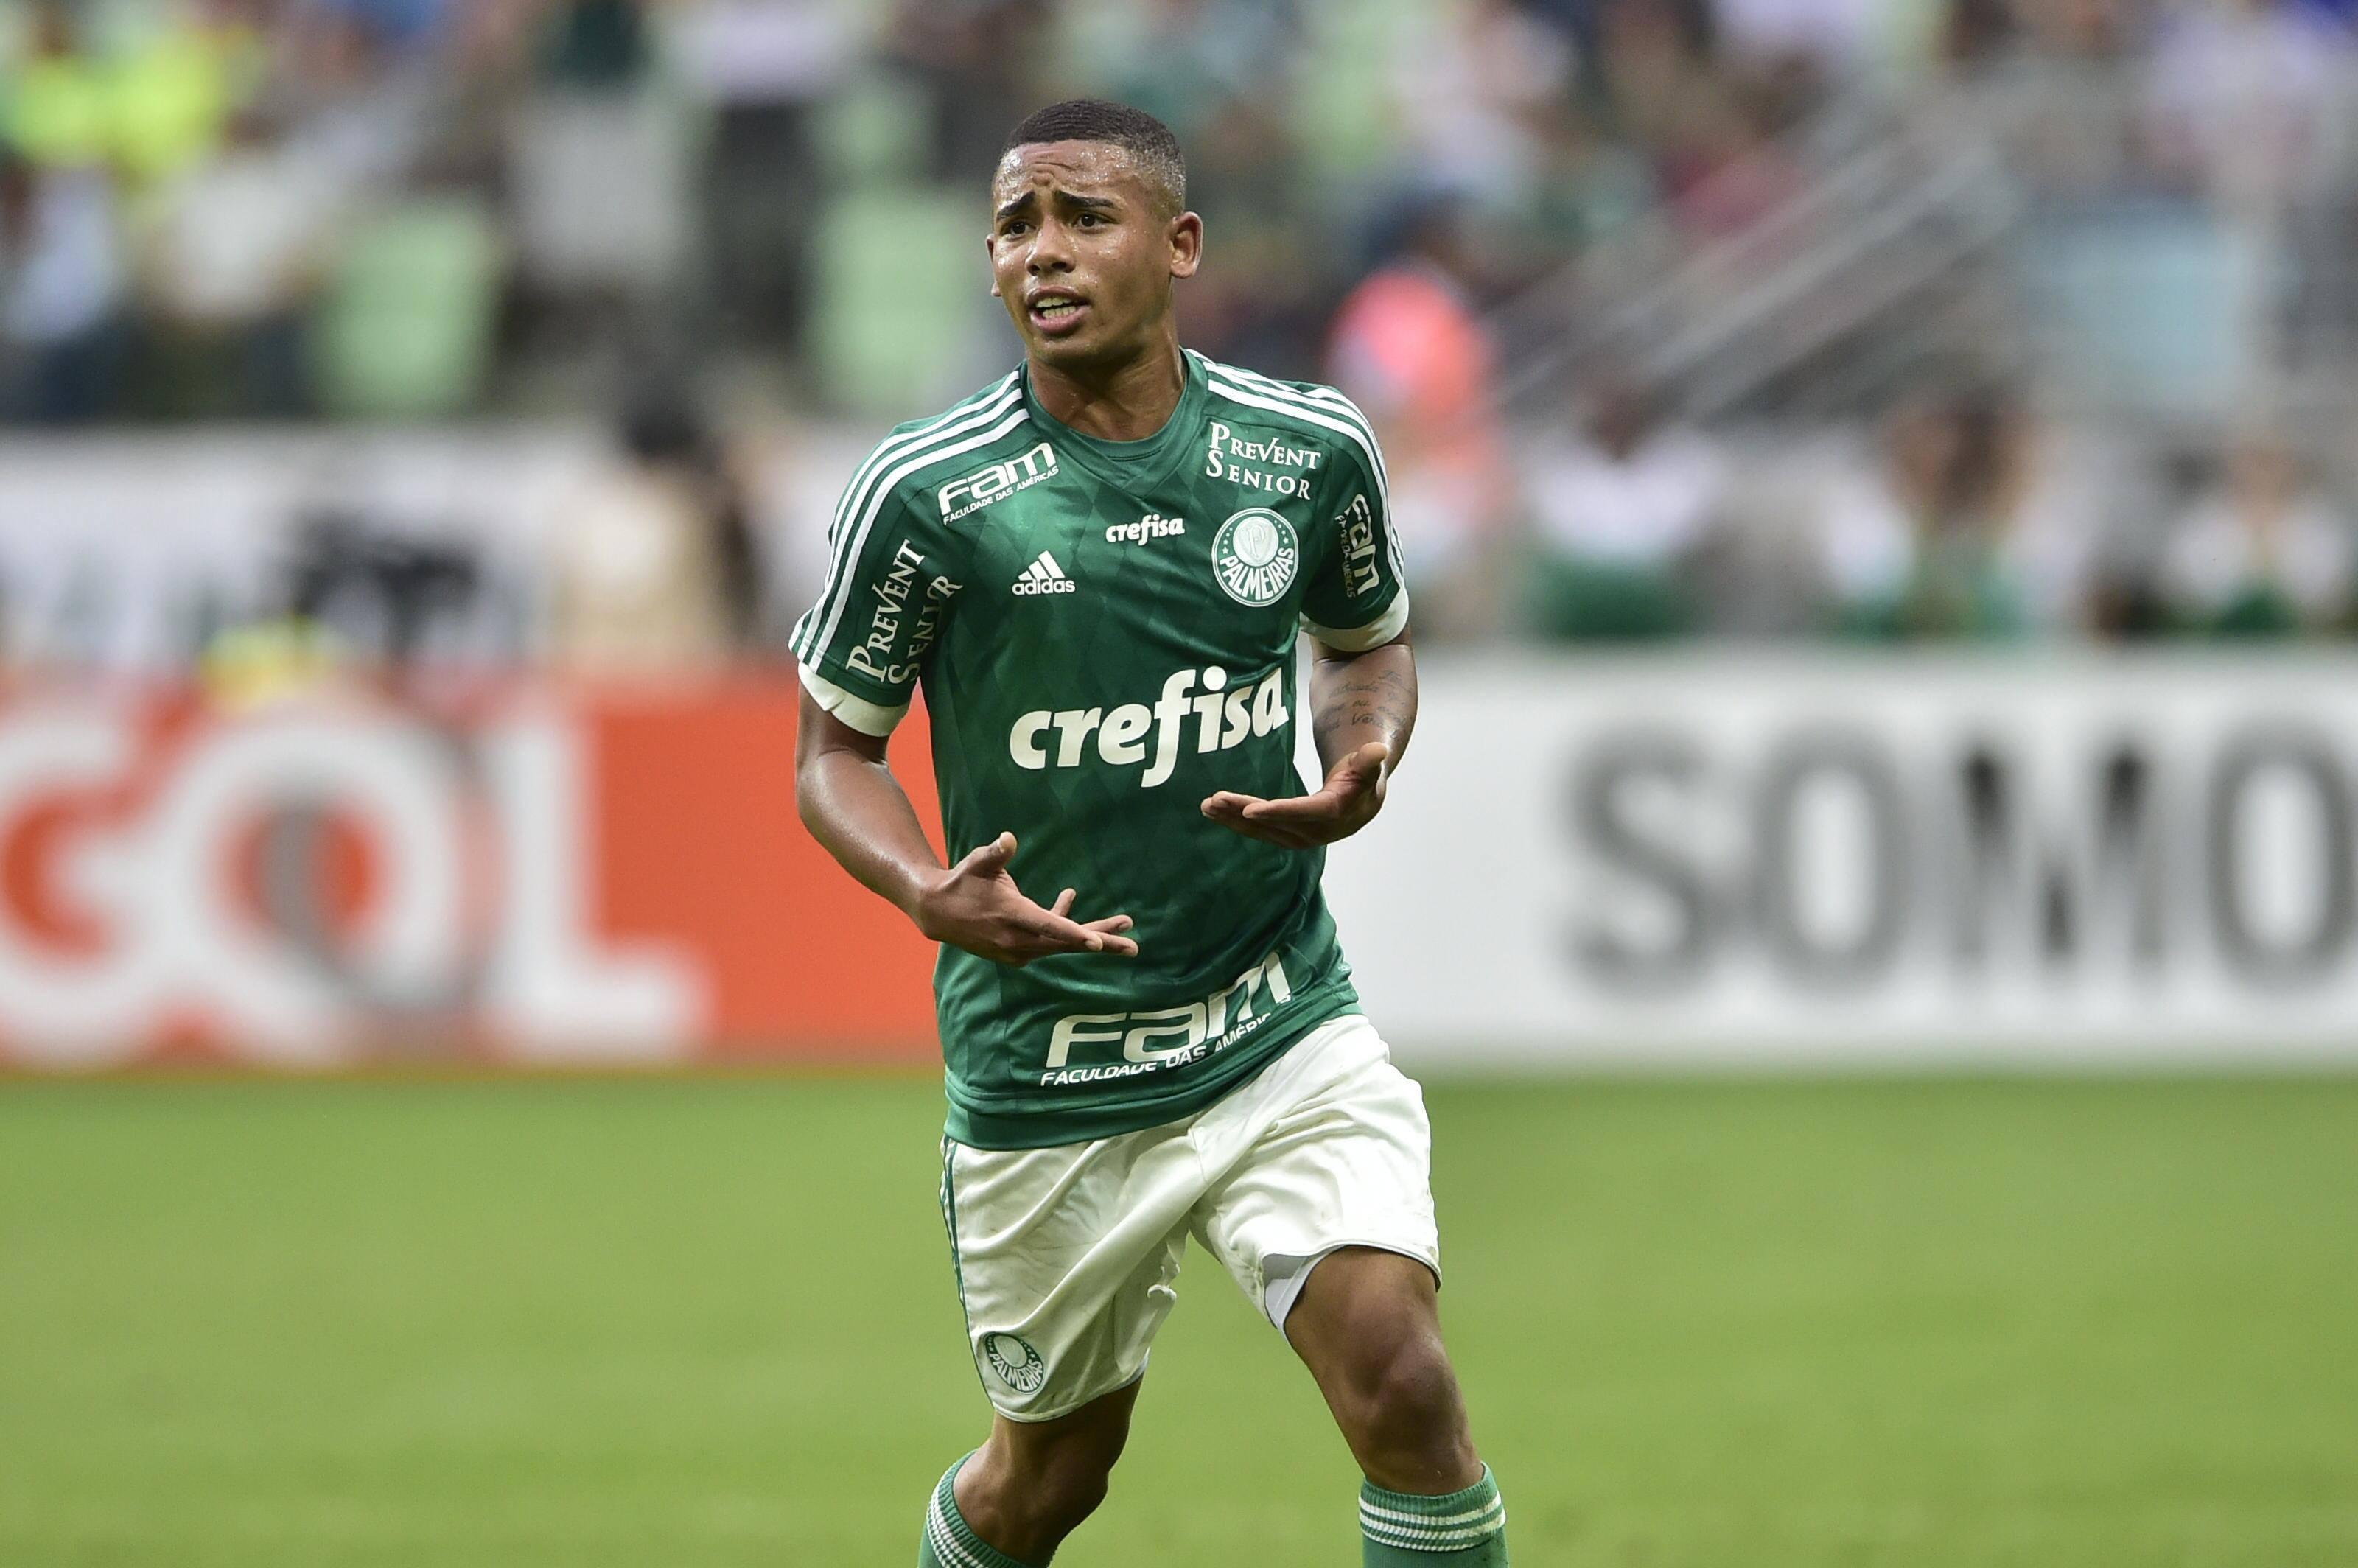 Bahia Palmeiras Maçı İddaa Tahmini 18 Haziran 2017